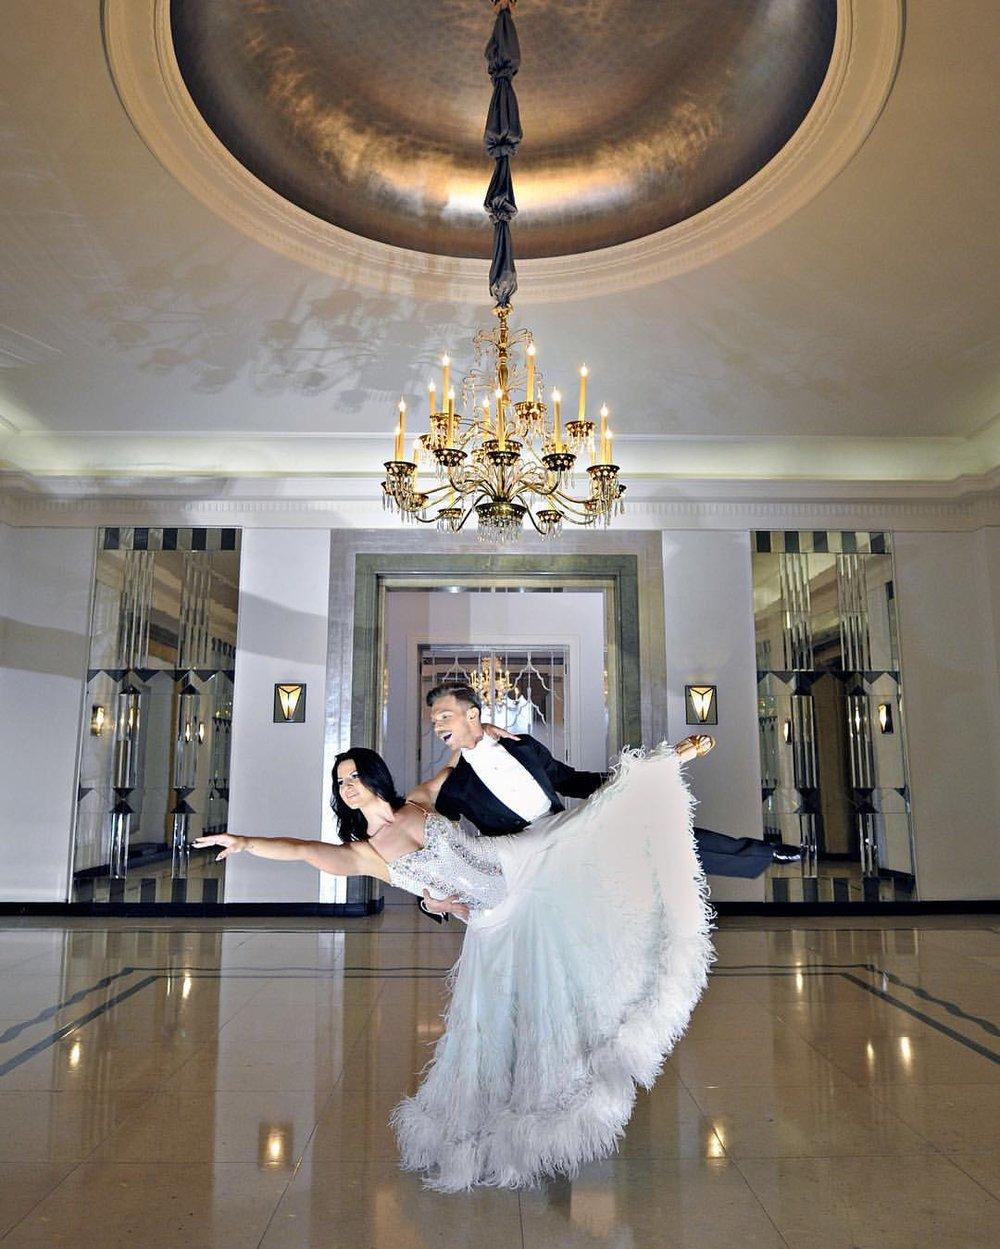 Award-winning Ballroom and Latin Dancer | Teacher | Choreographer | Dance Lessons | London